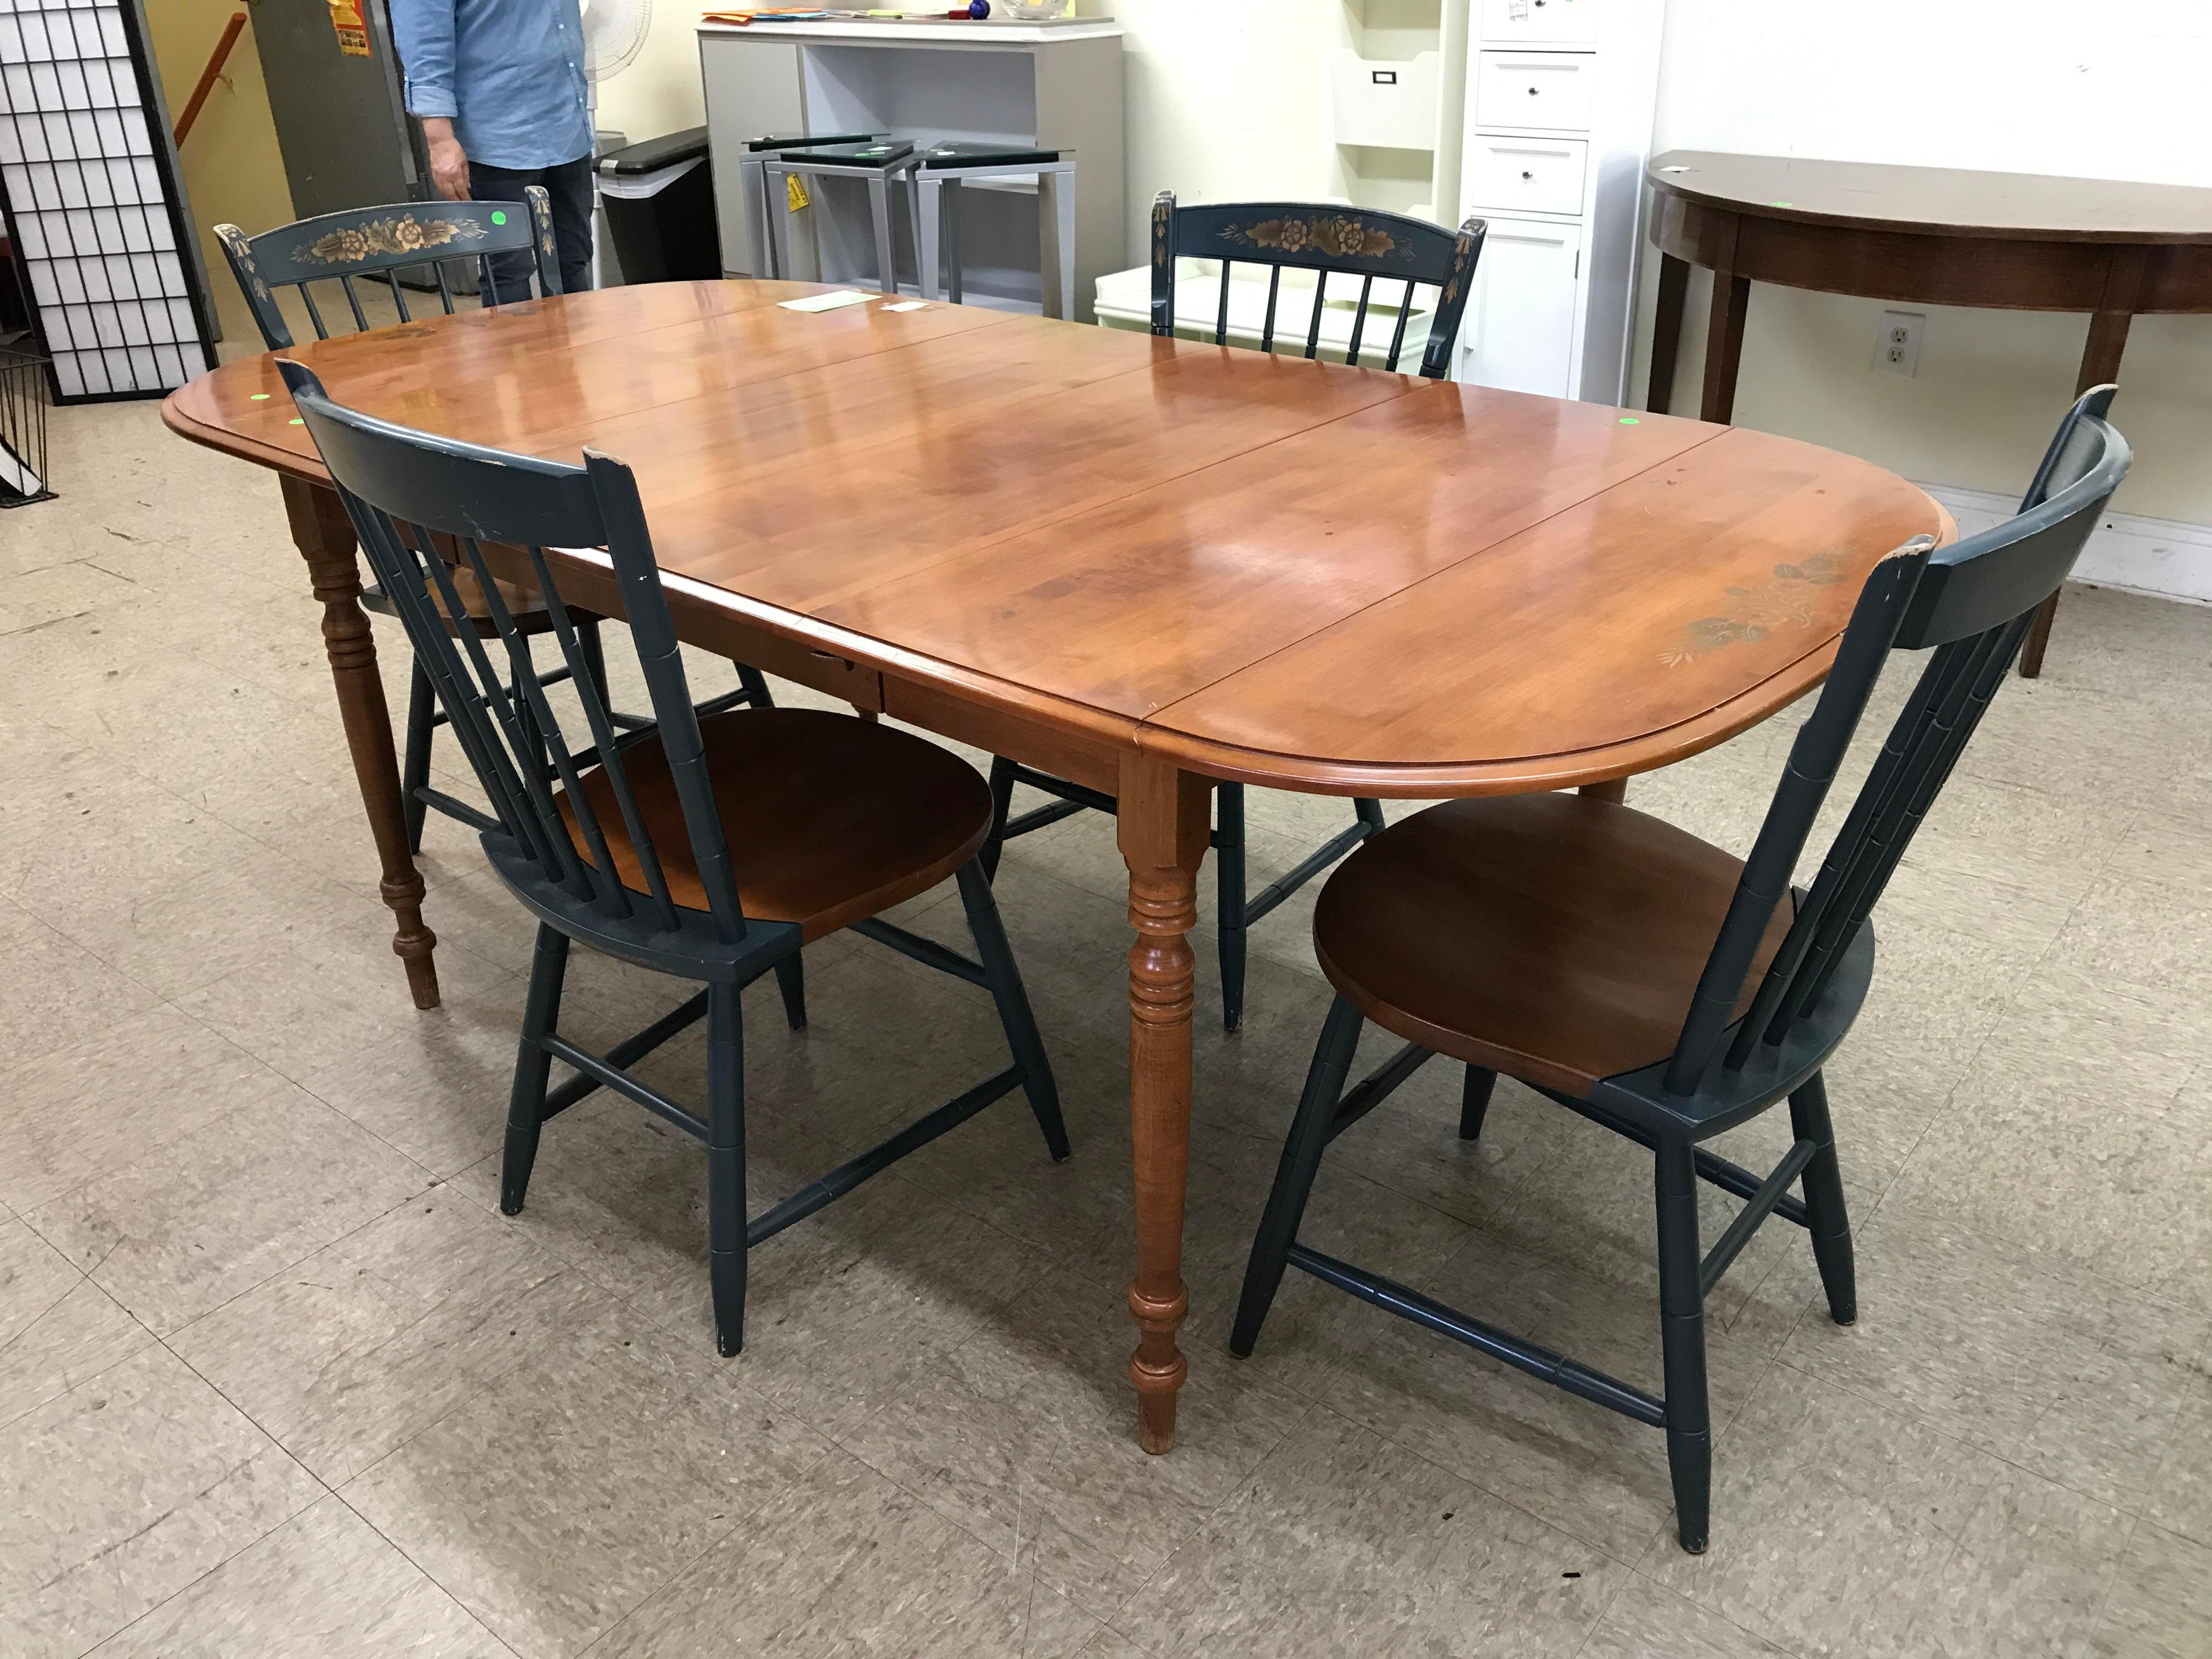 hitchcock drop leaf table & chairs   chairish